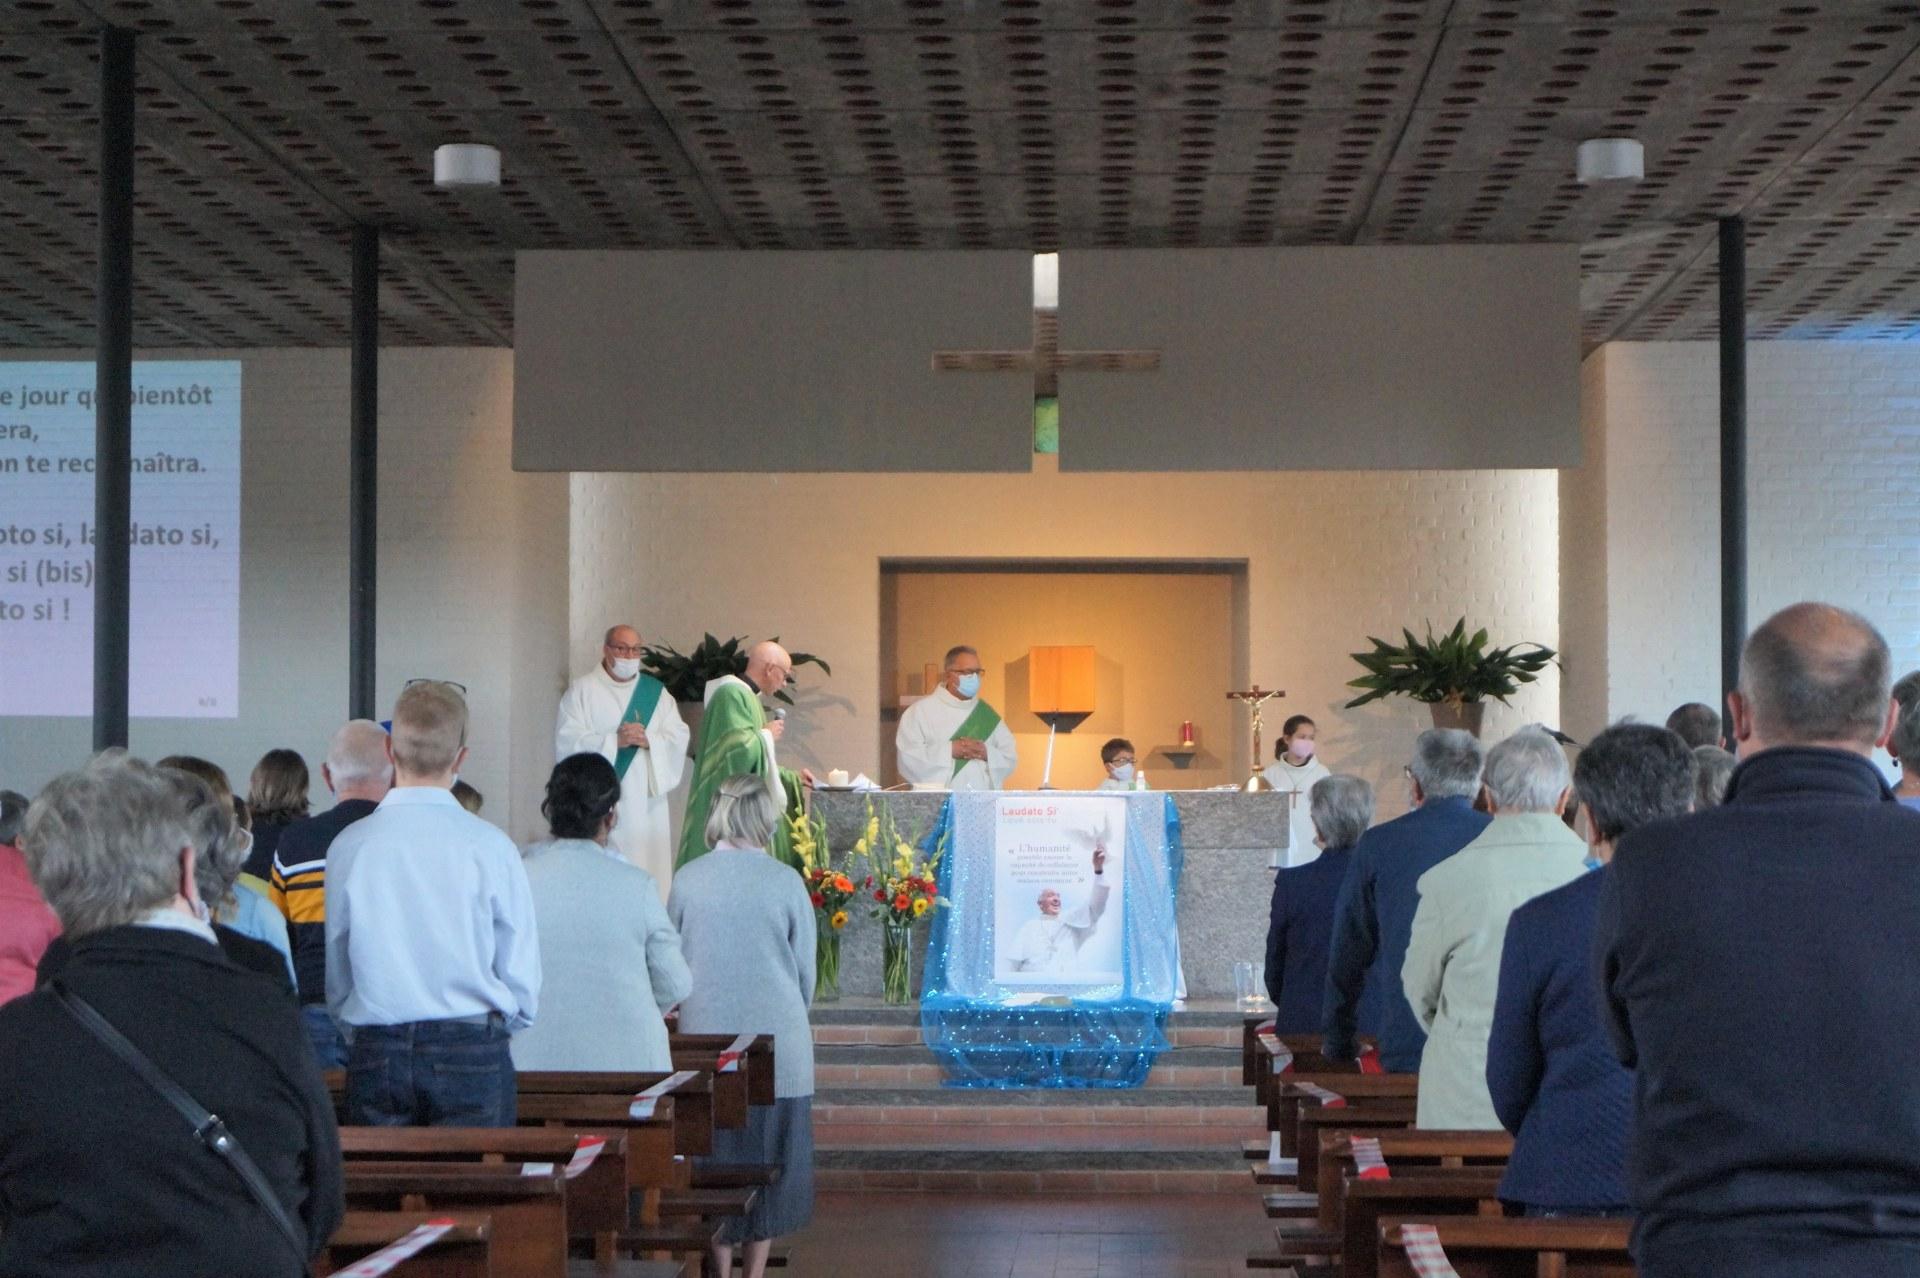 entree en catechumenat 6 sept 2020 (5)